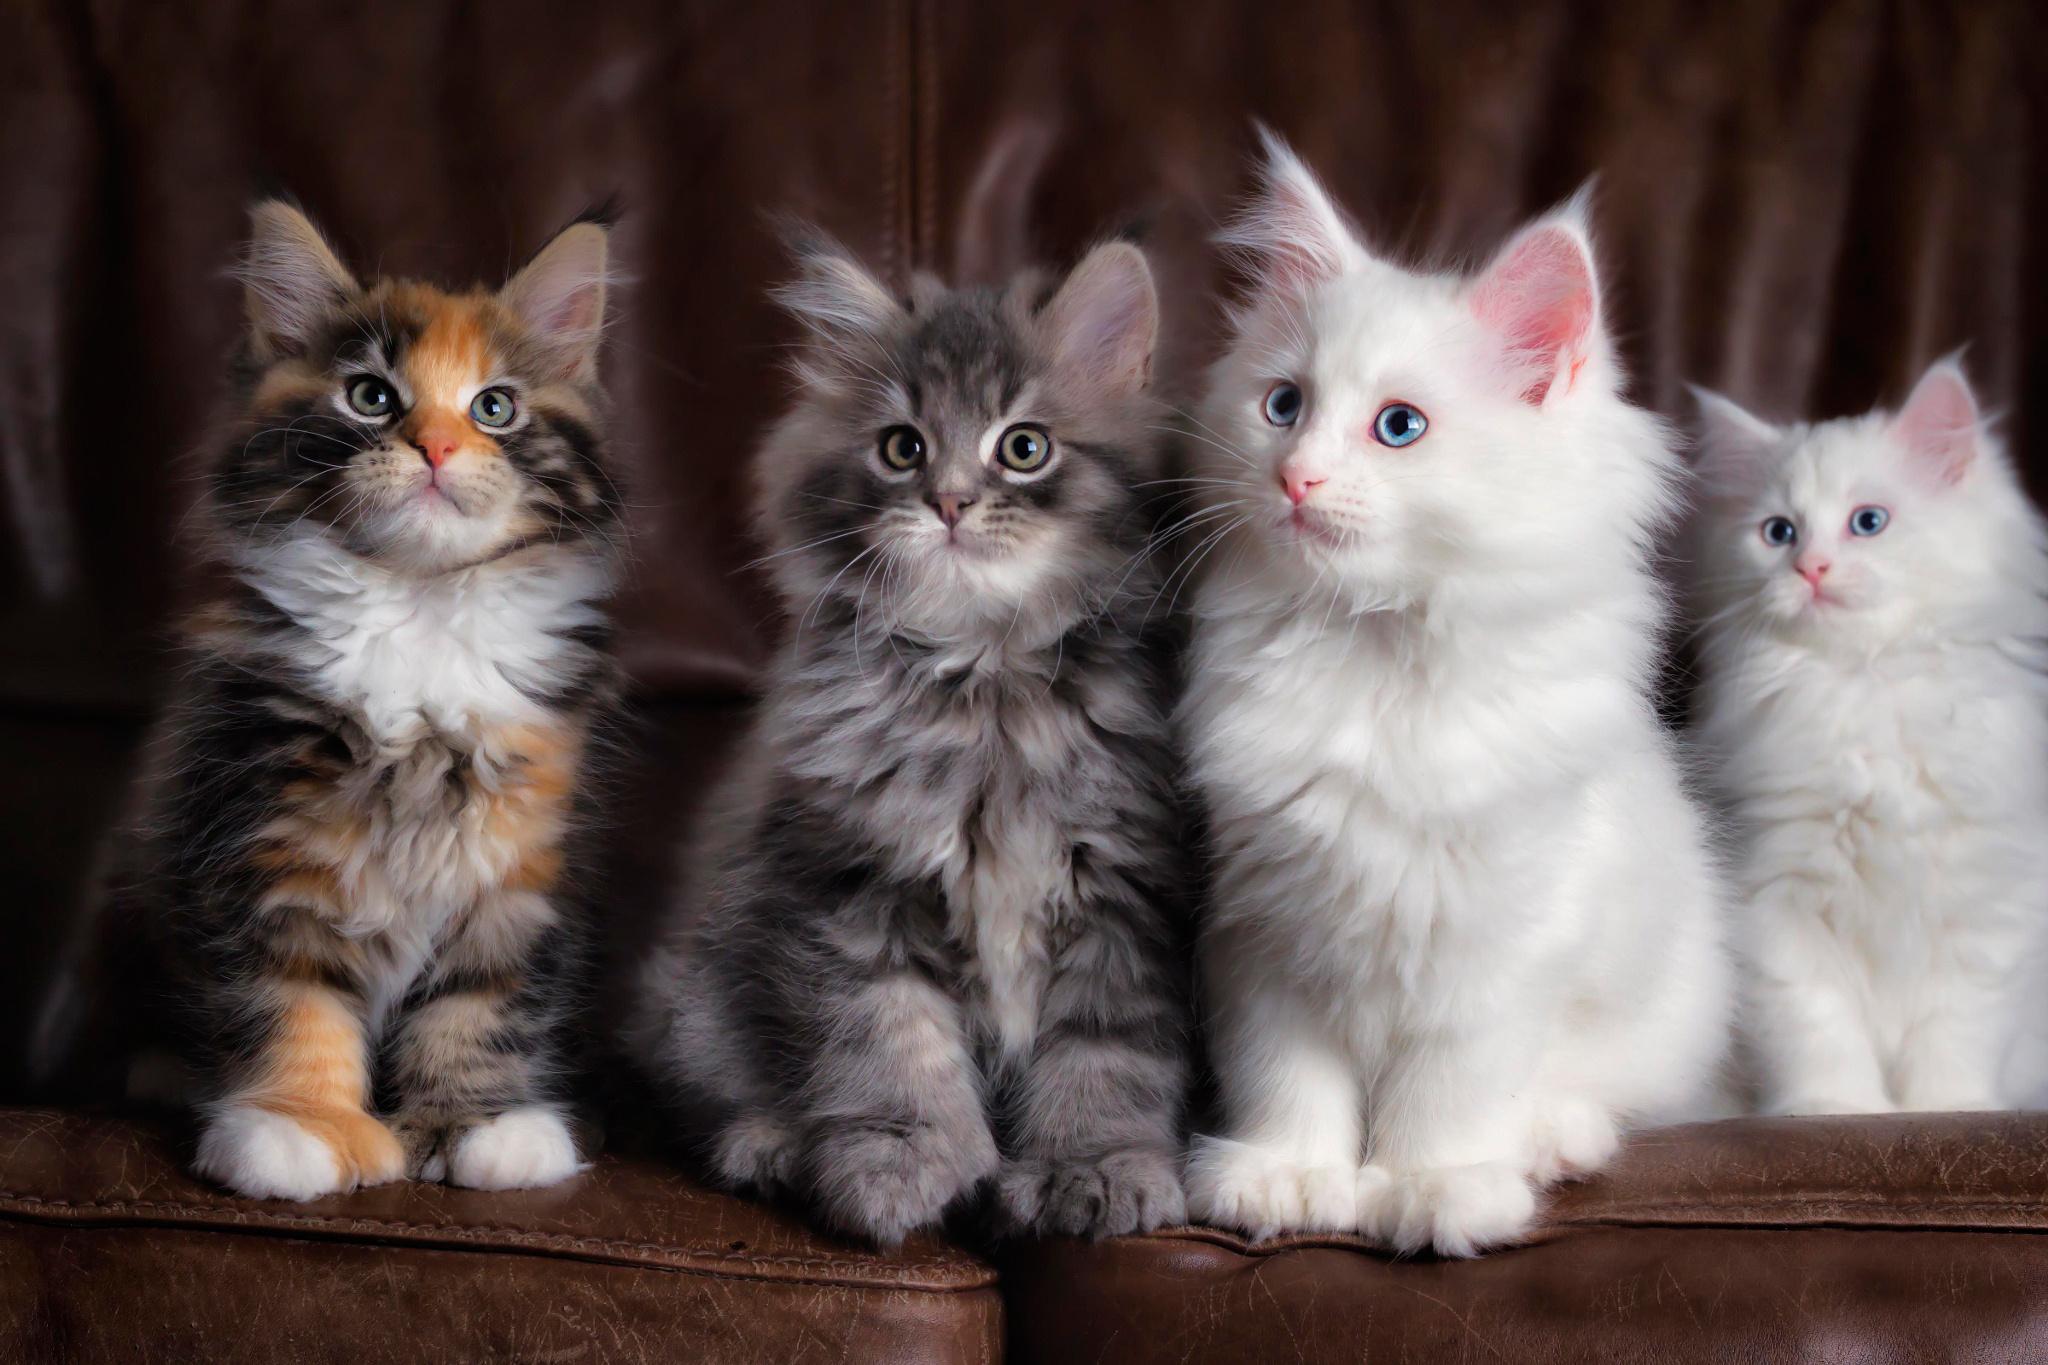 римляне картинки кошаки и котята потребуется